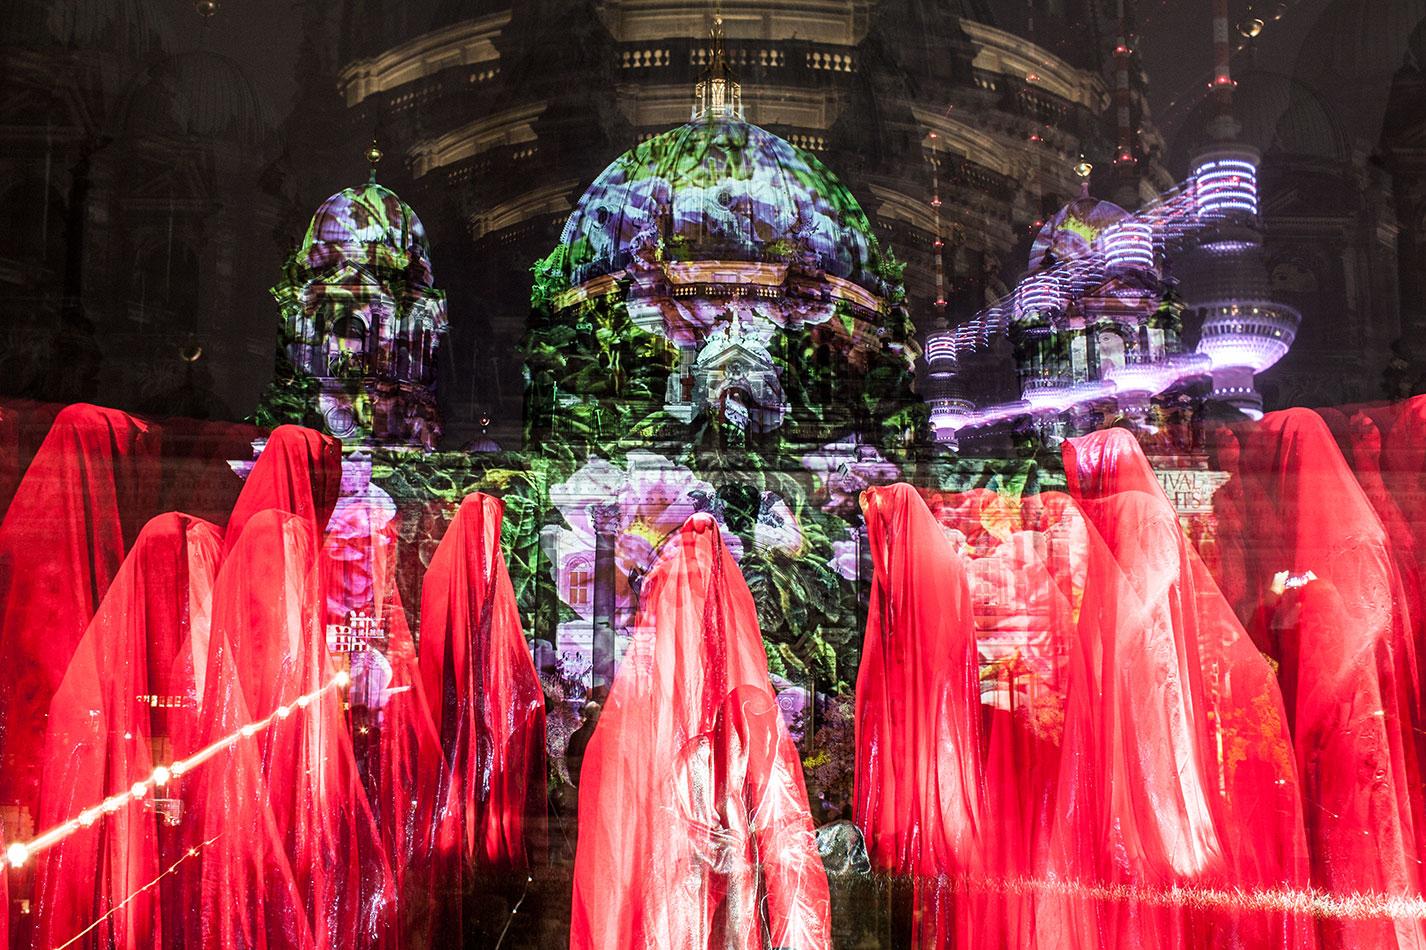 festival-of-lights-old-museum-cathedral-berlin-light-art-show-exhibition-lumina-guardians-of-time-manfred-kili-kielnhofer-contemporary-arts-design-sculpture-3048